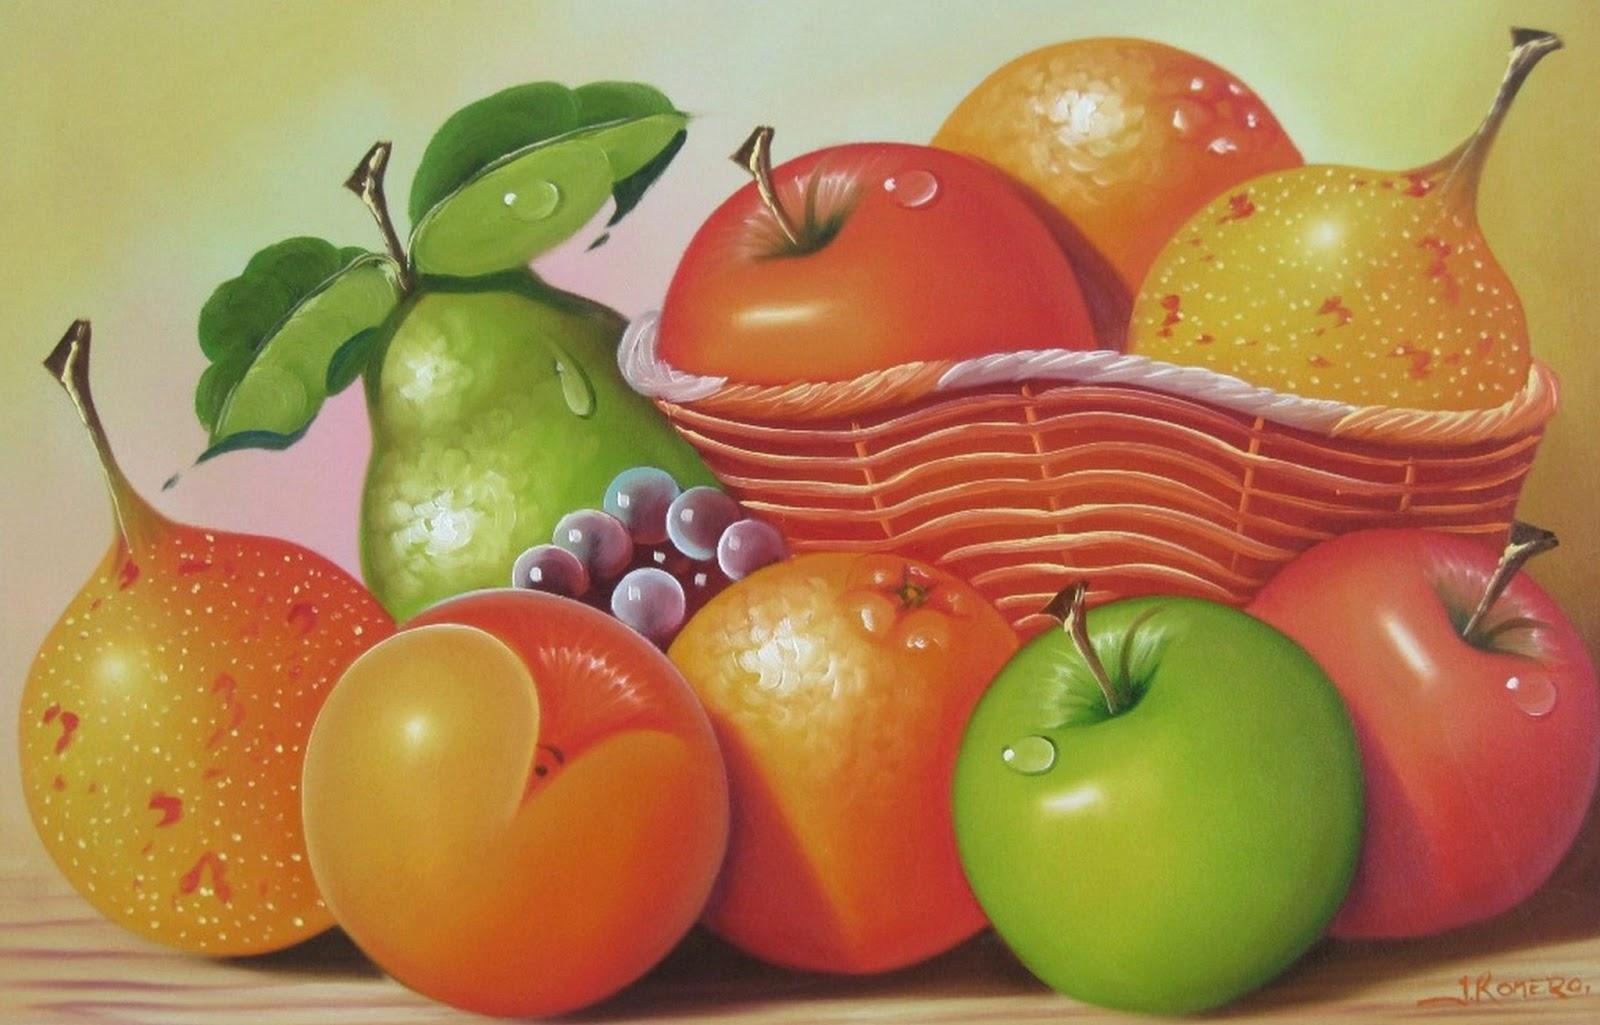 Cuadros de frutas para comedor imagui for Cuadros para cocina